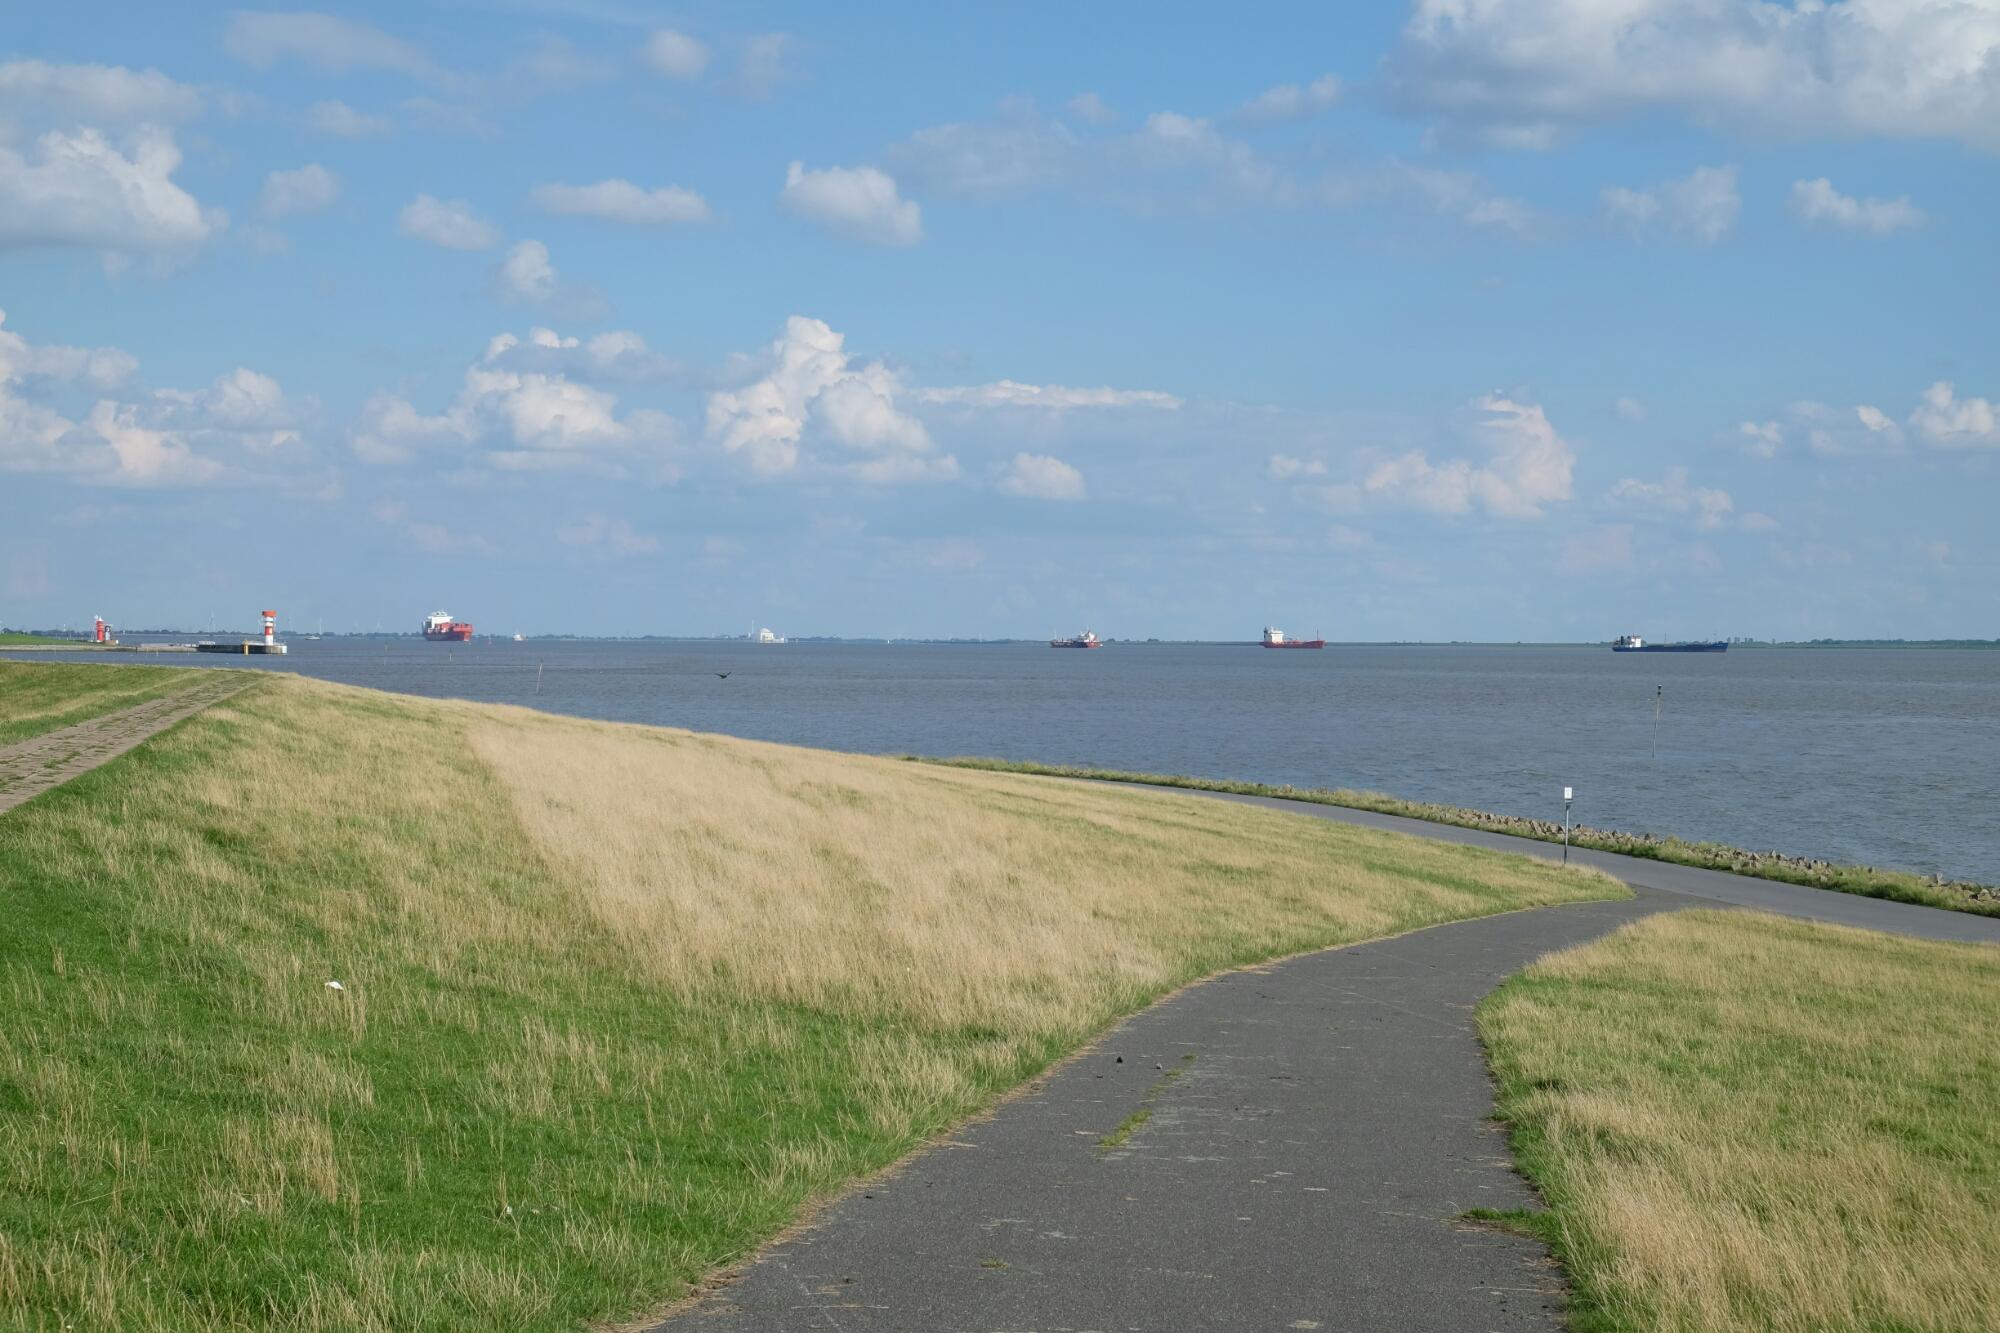 Pötte kucken an der Elbe bei Brunsbüttel